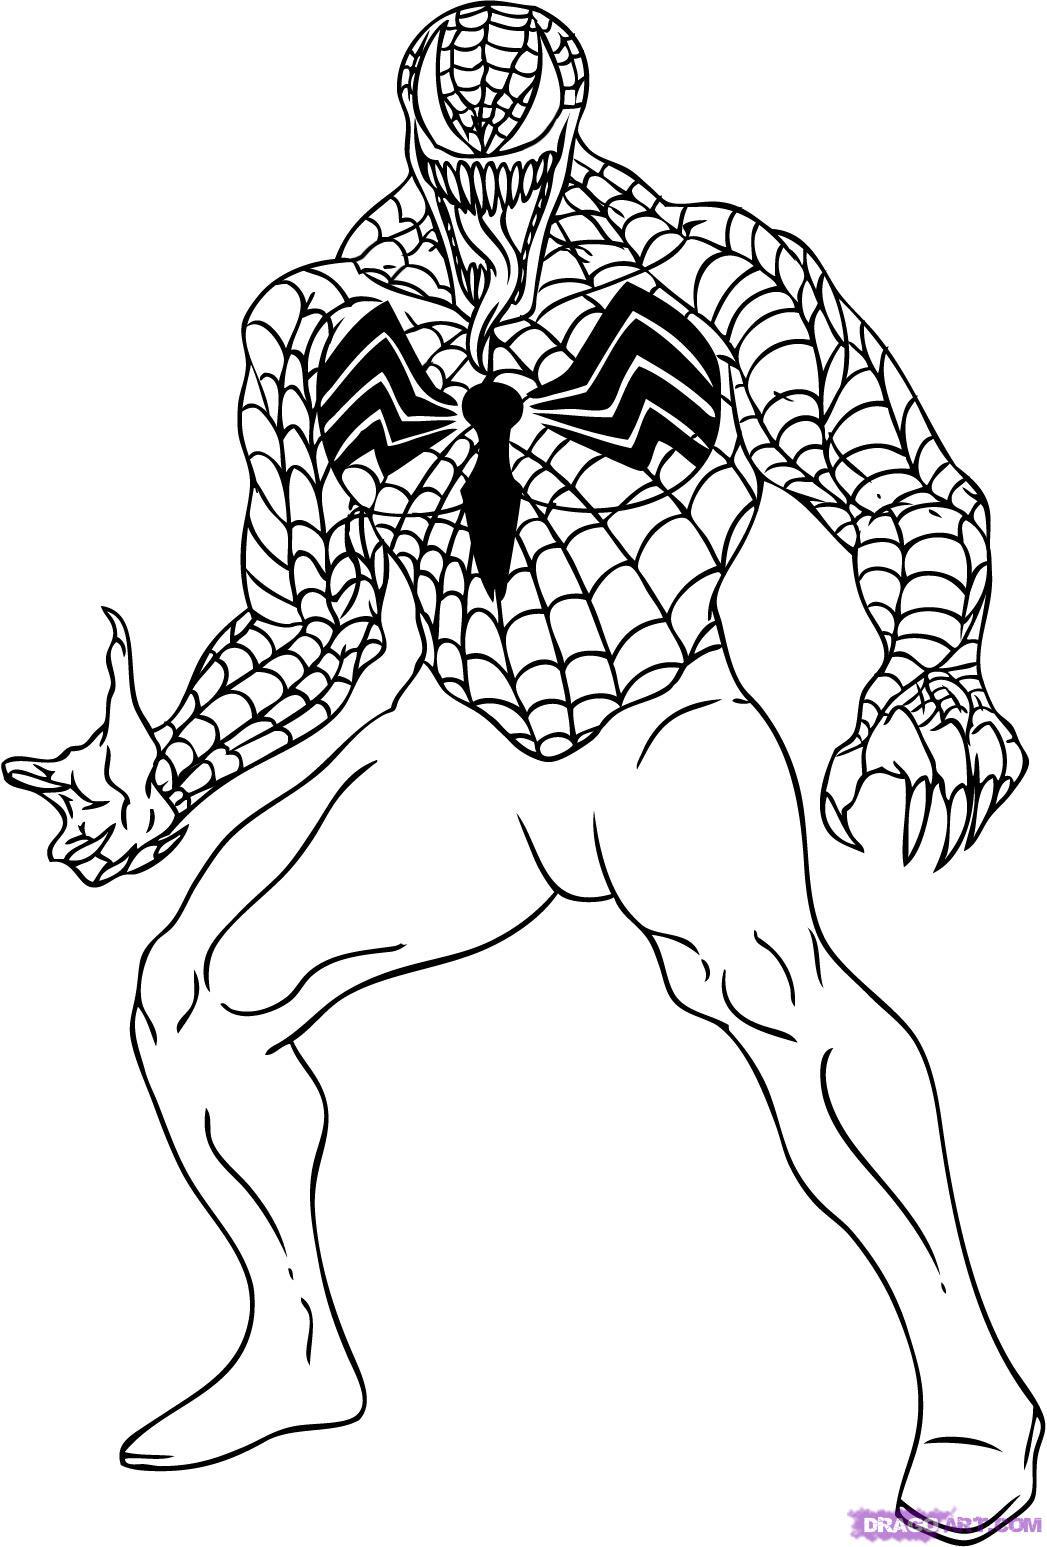 Printable Venom Coloring Pages Me Spiderman